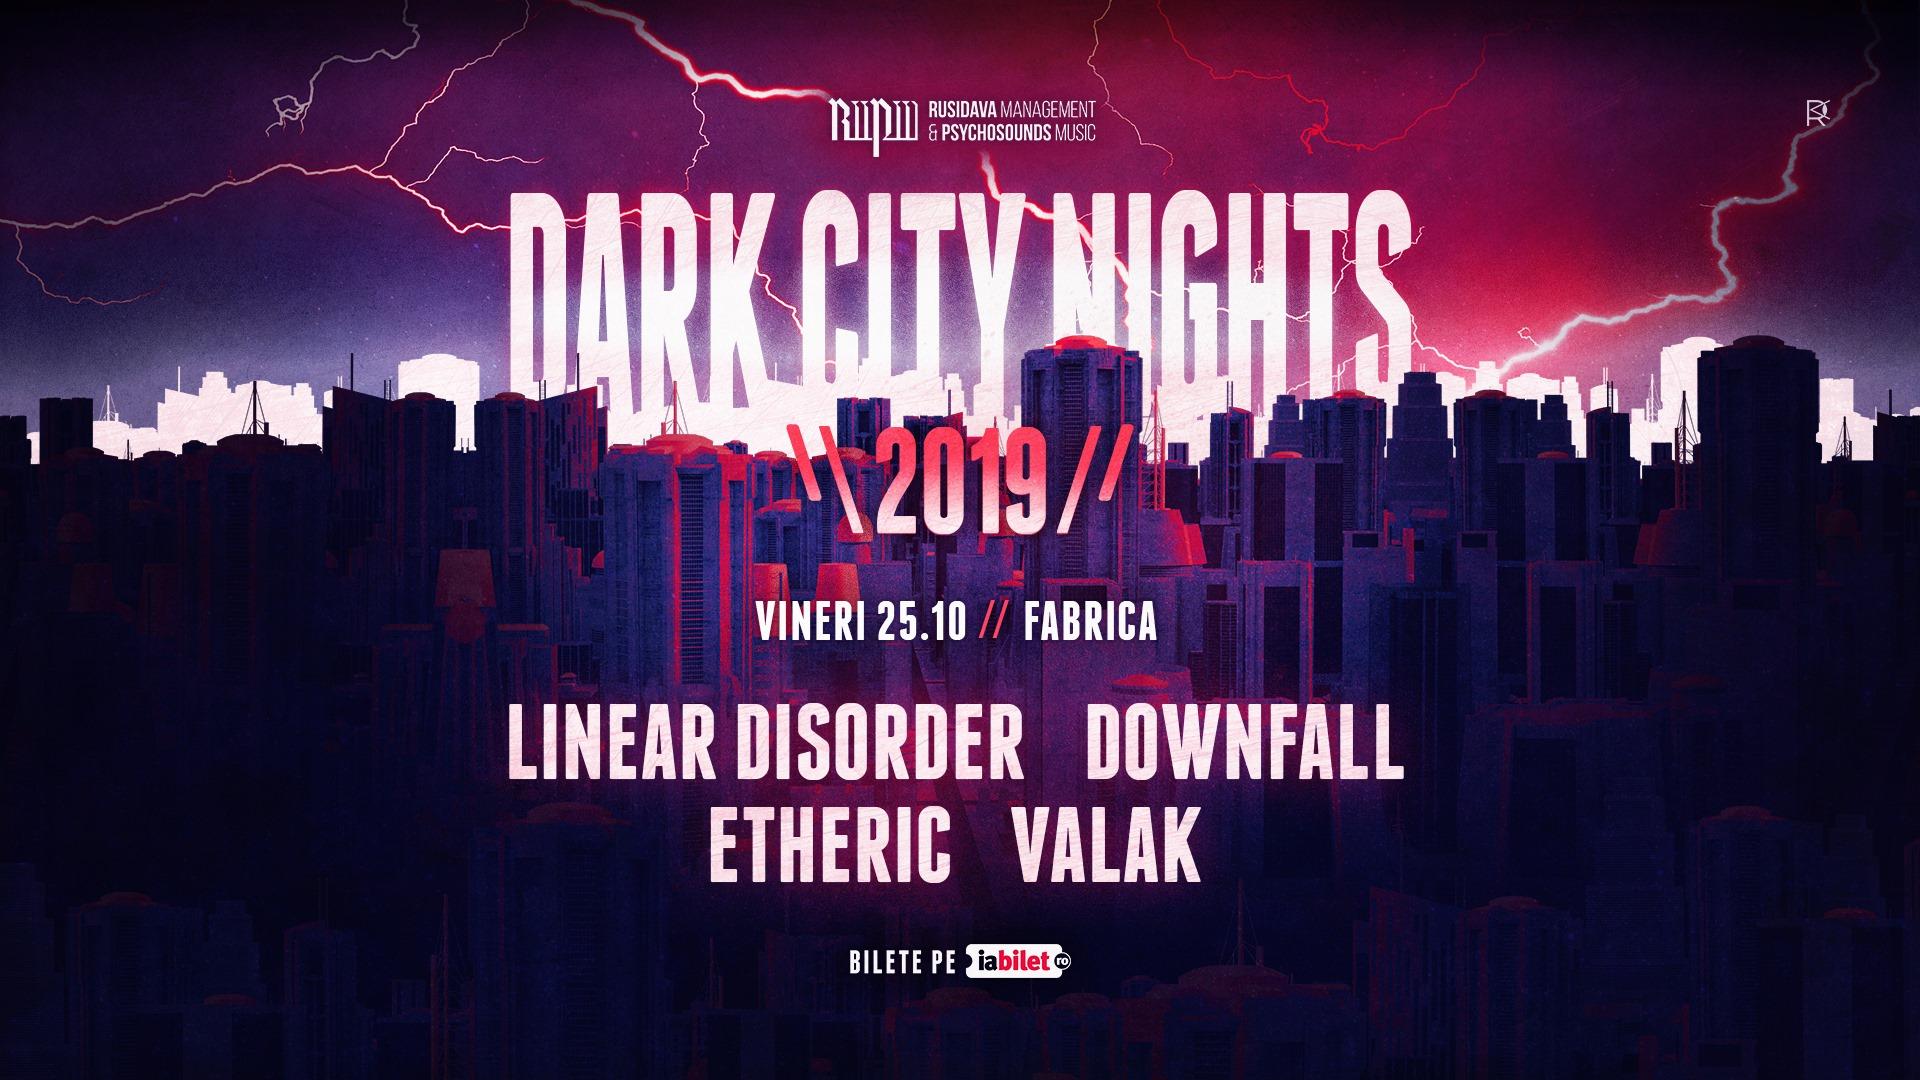 Dark City Nights 2019